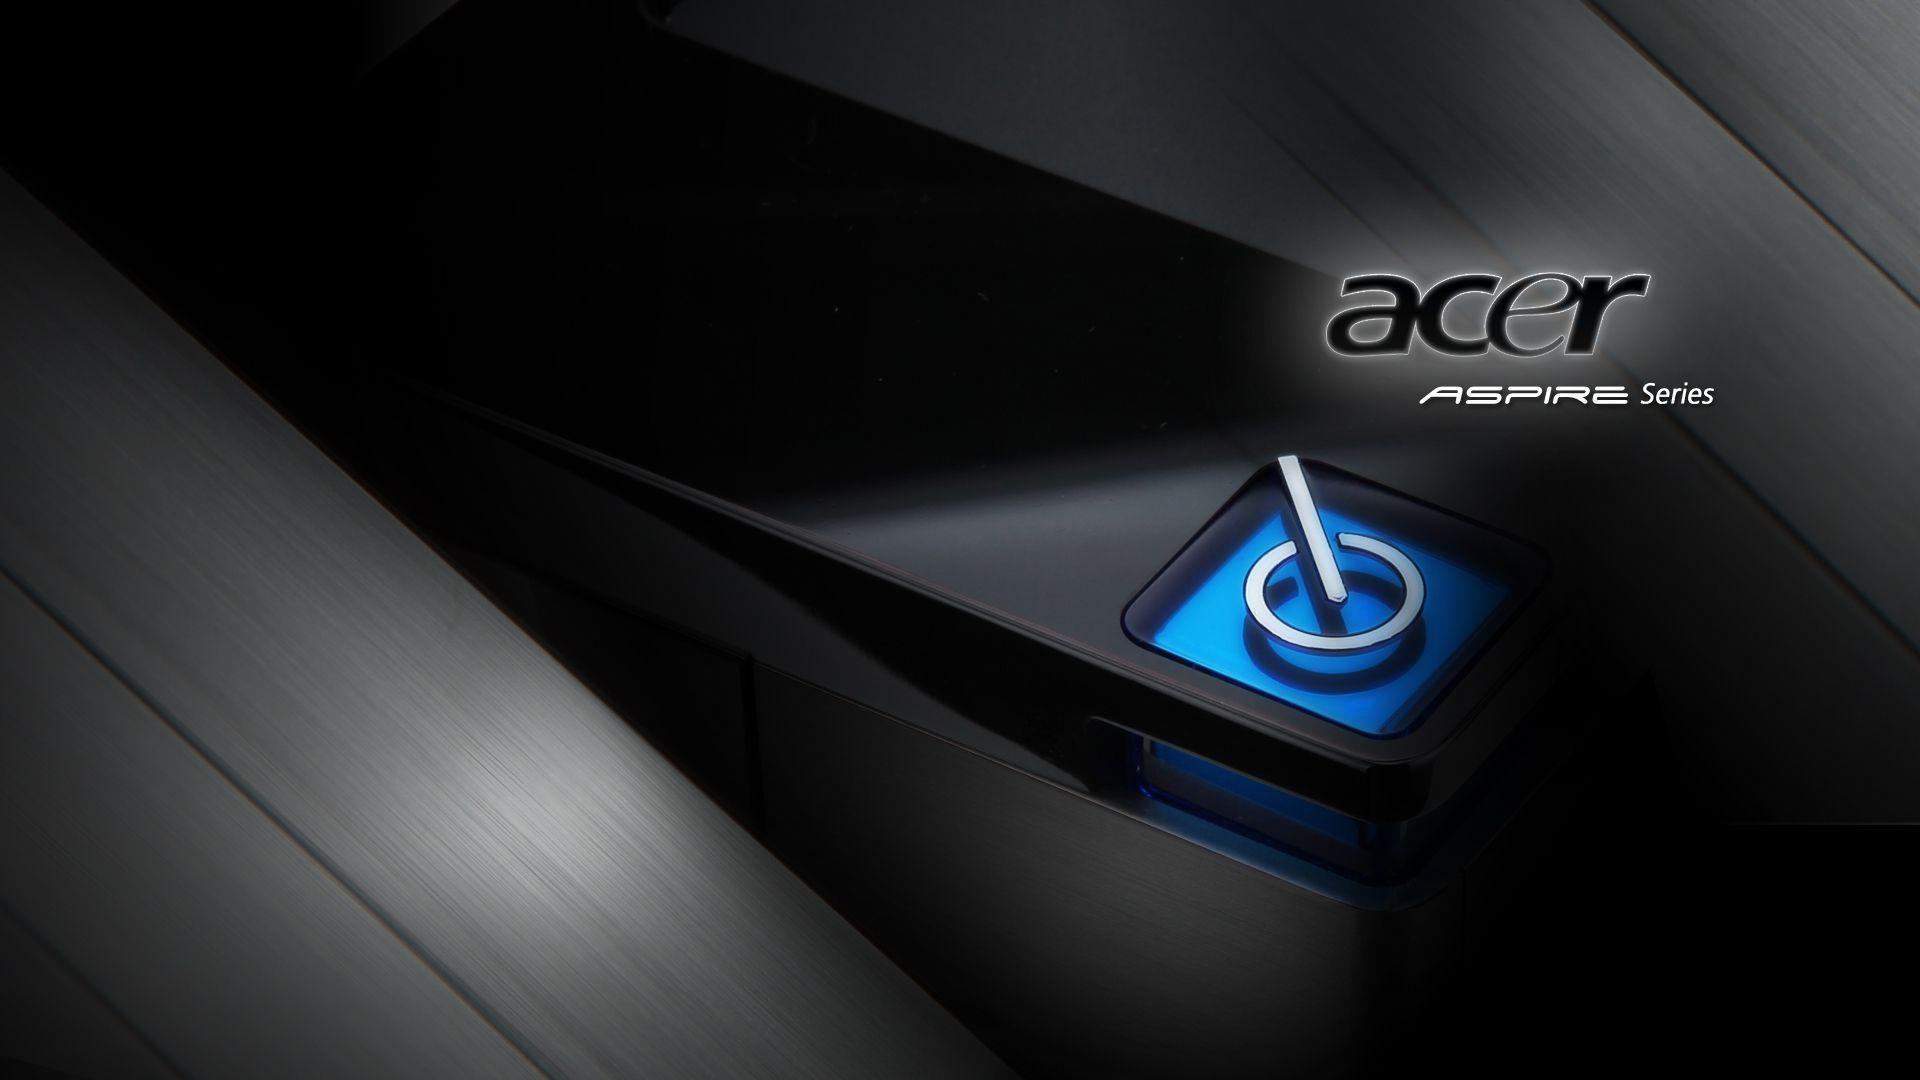 Acer Aspire Blue Desktop Pc And Mac Wallpaper